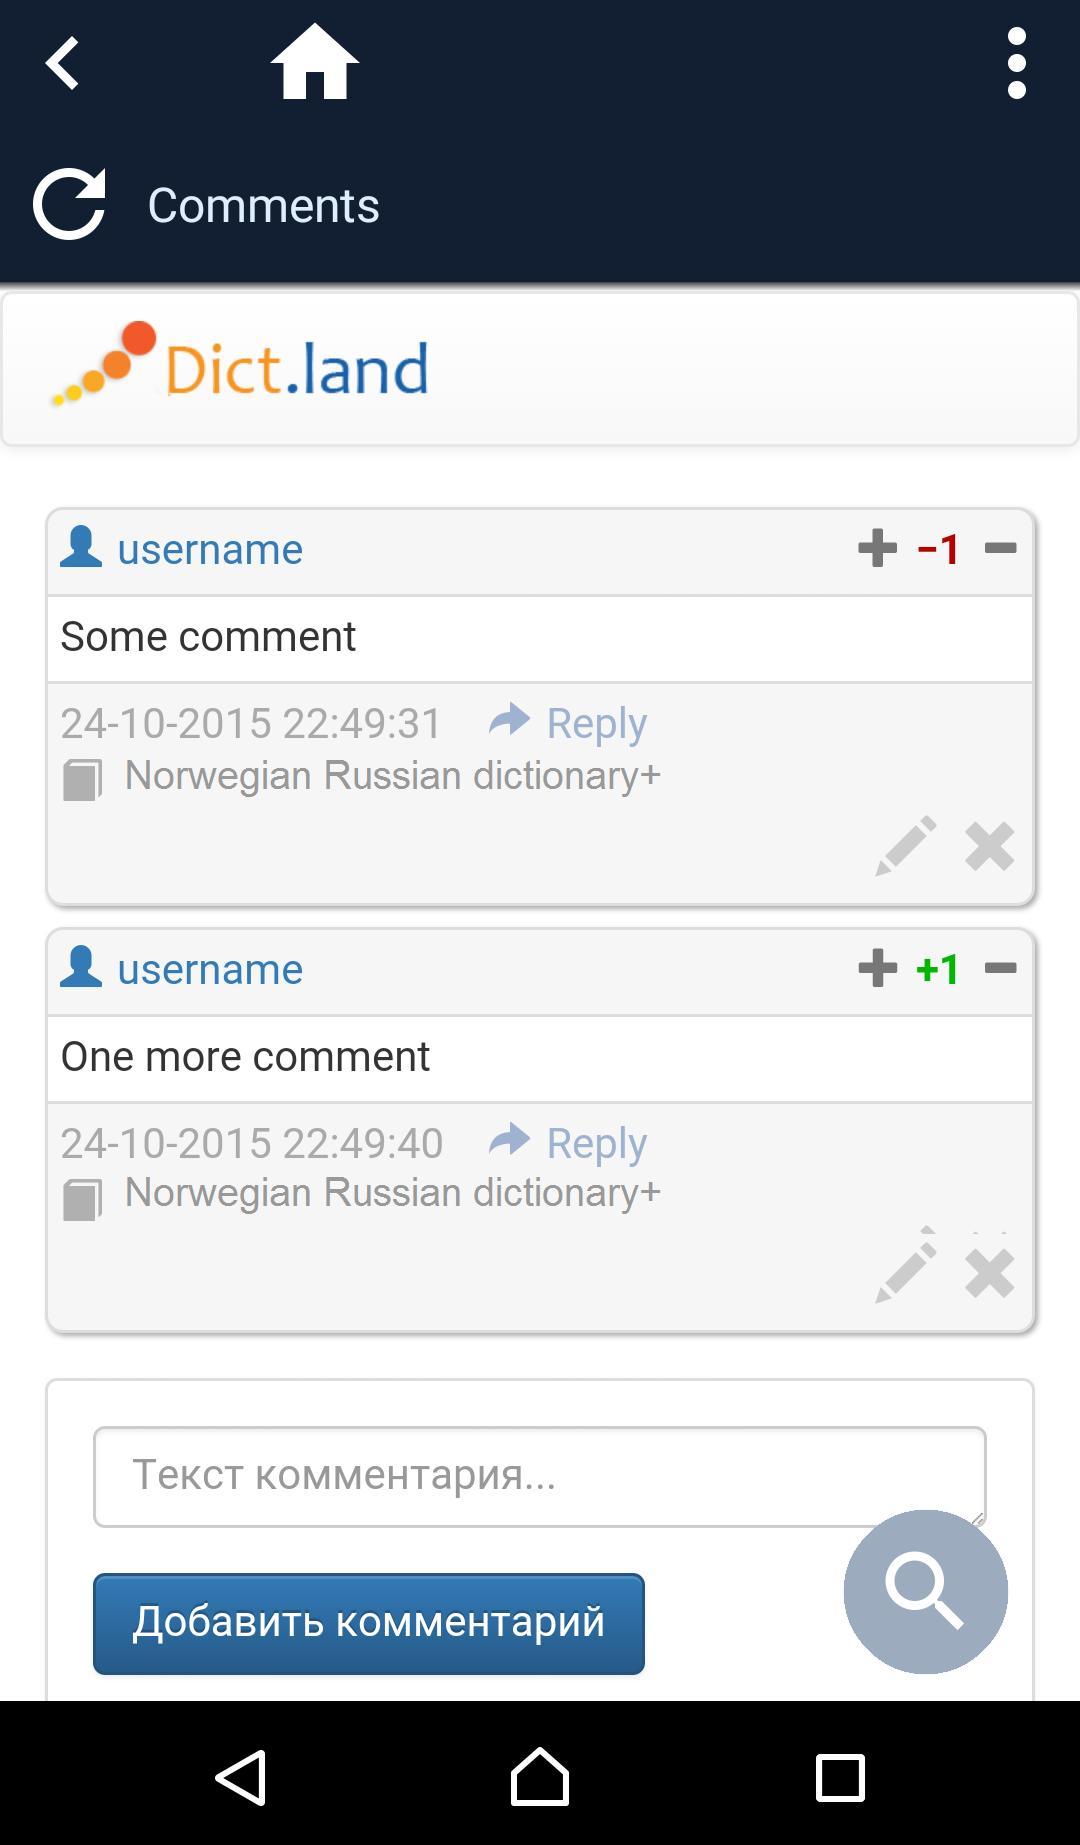 Norwegian Russian dictionary poster